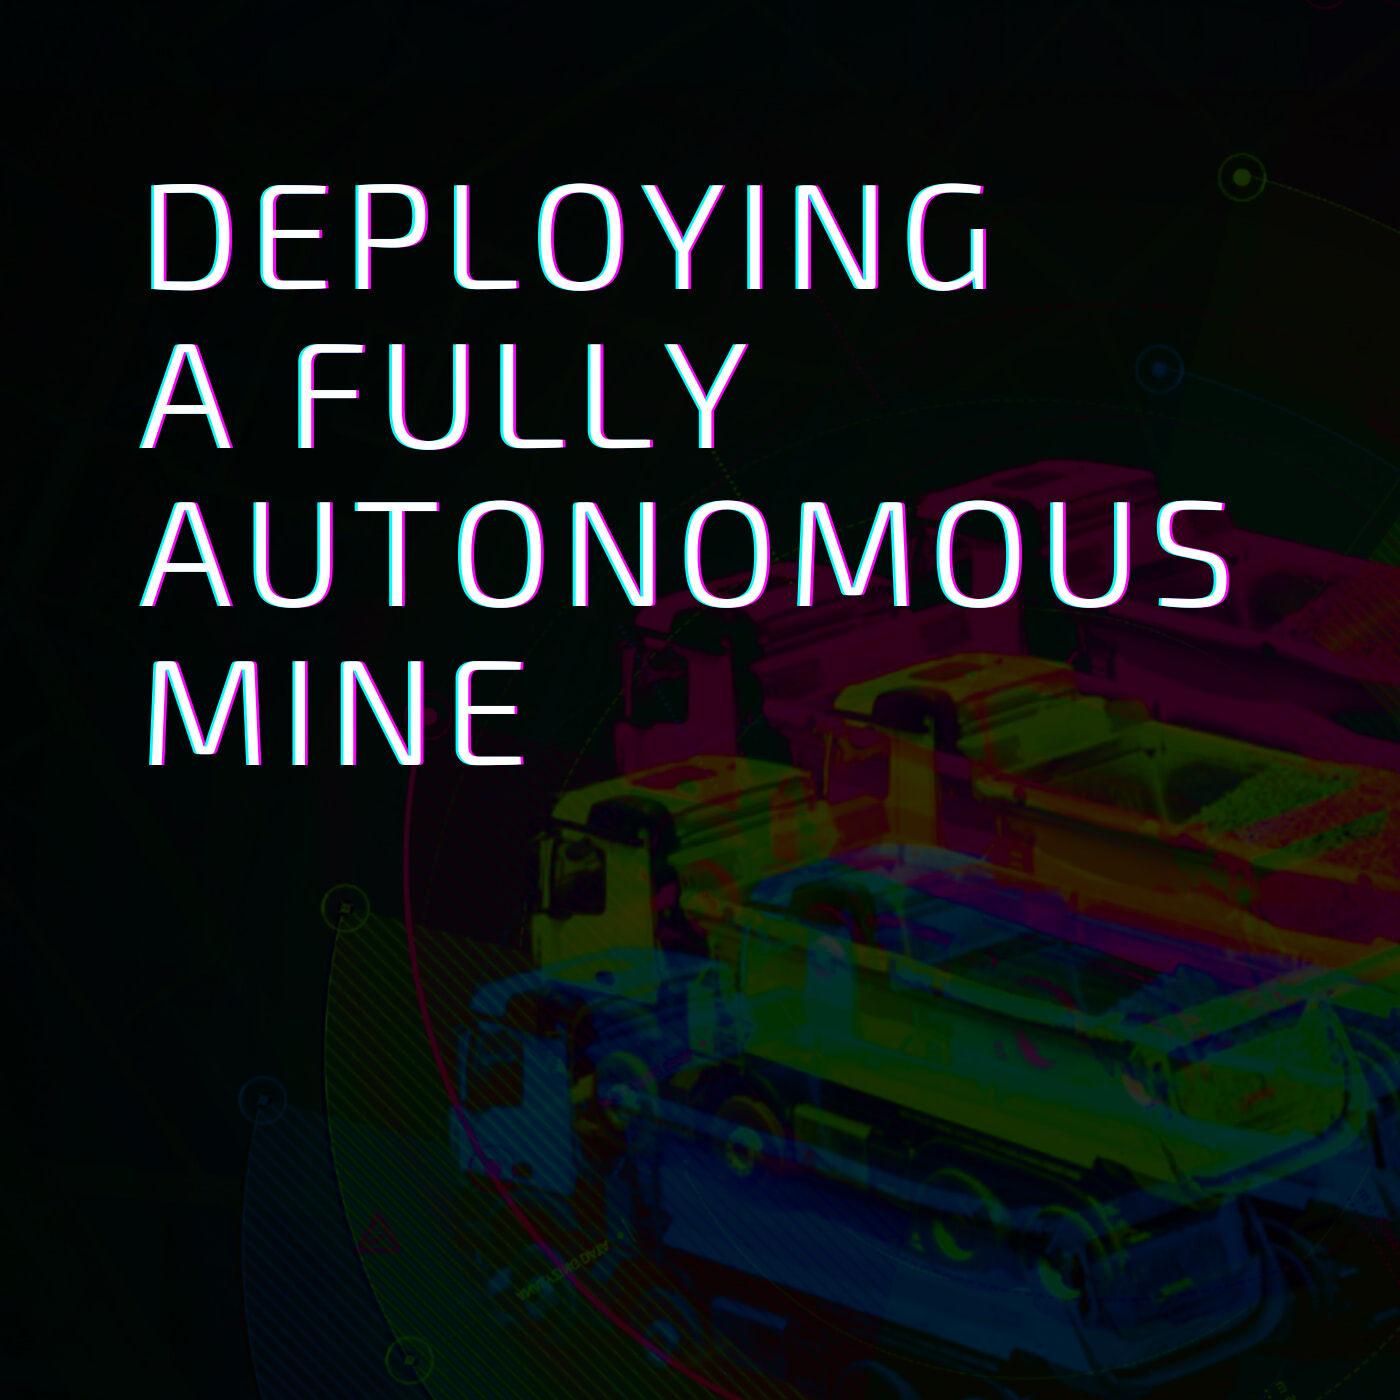 Deploying a Fully Autonomous Mine